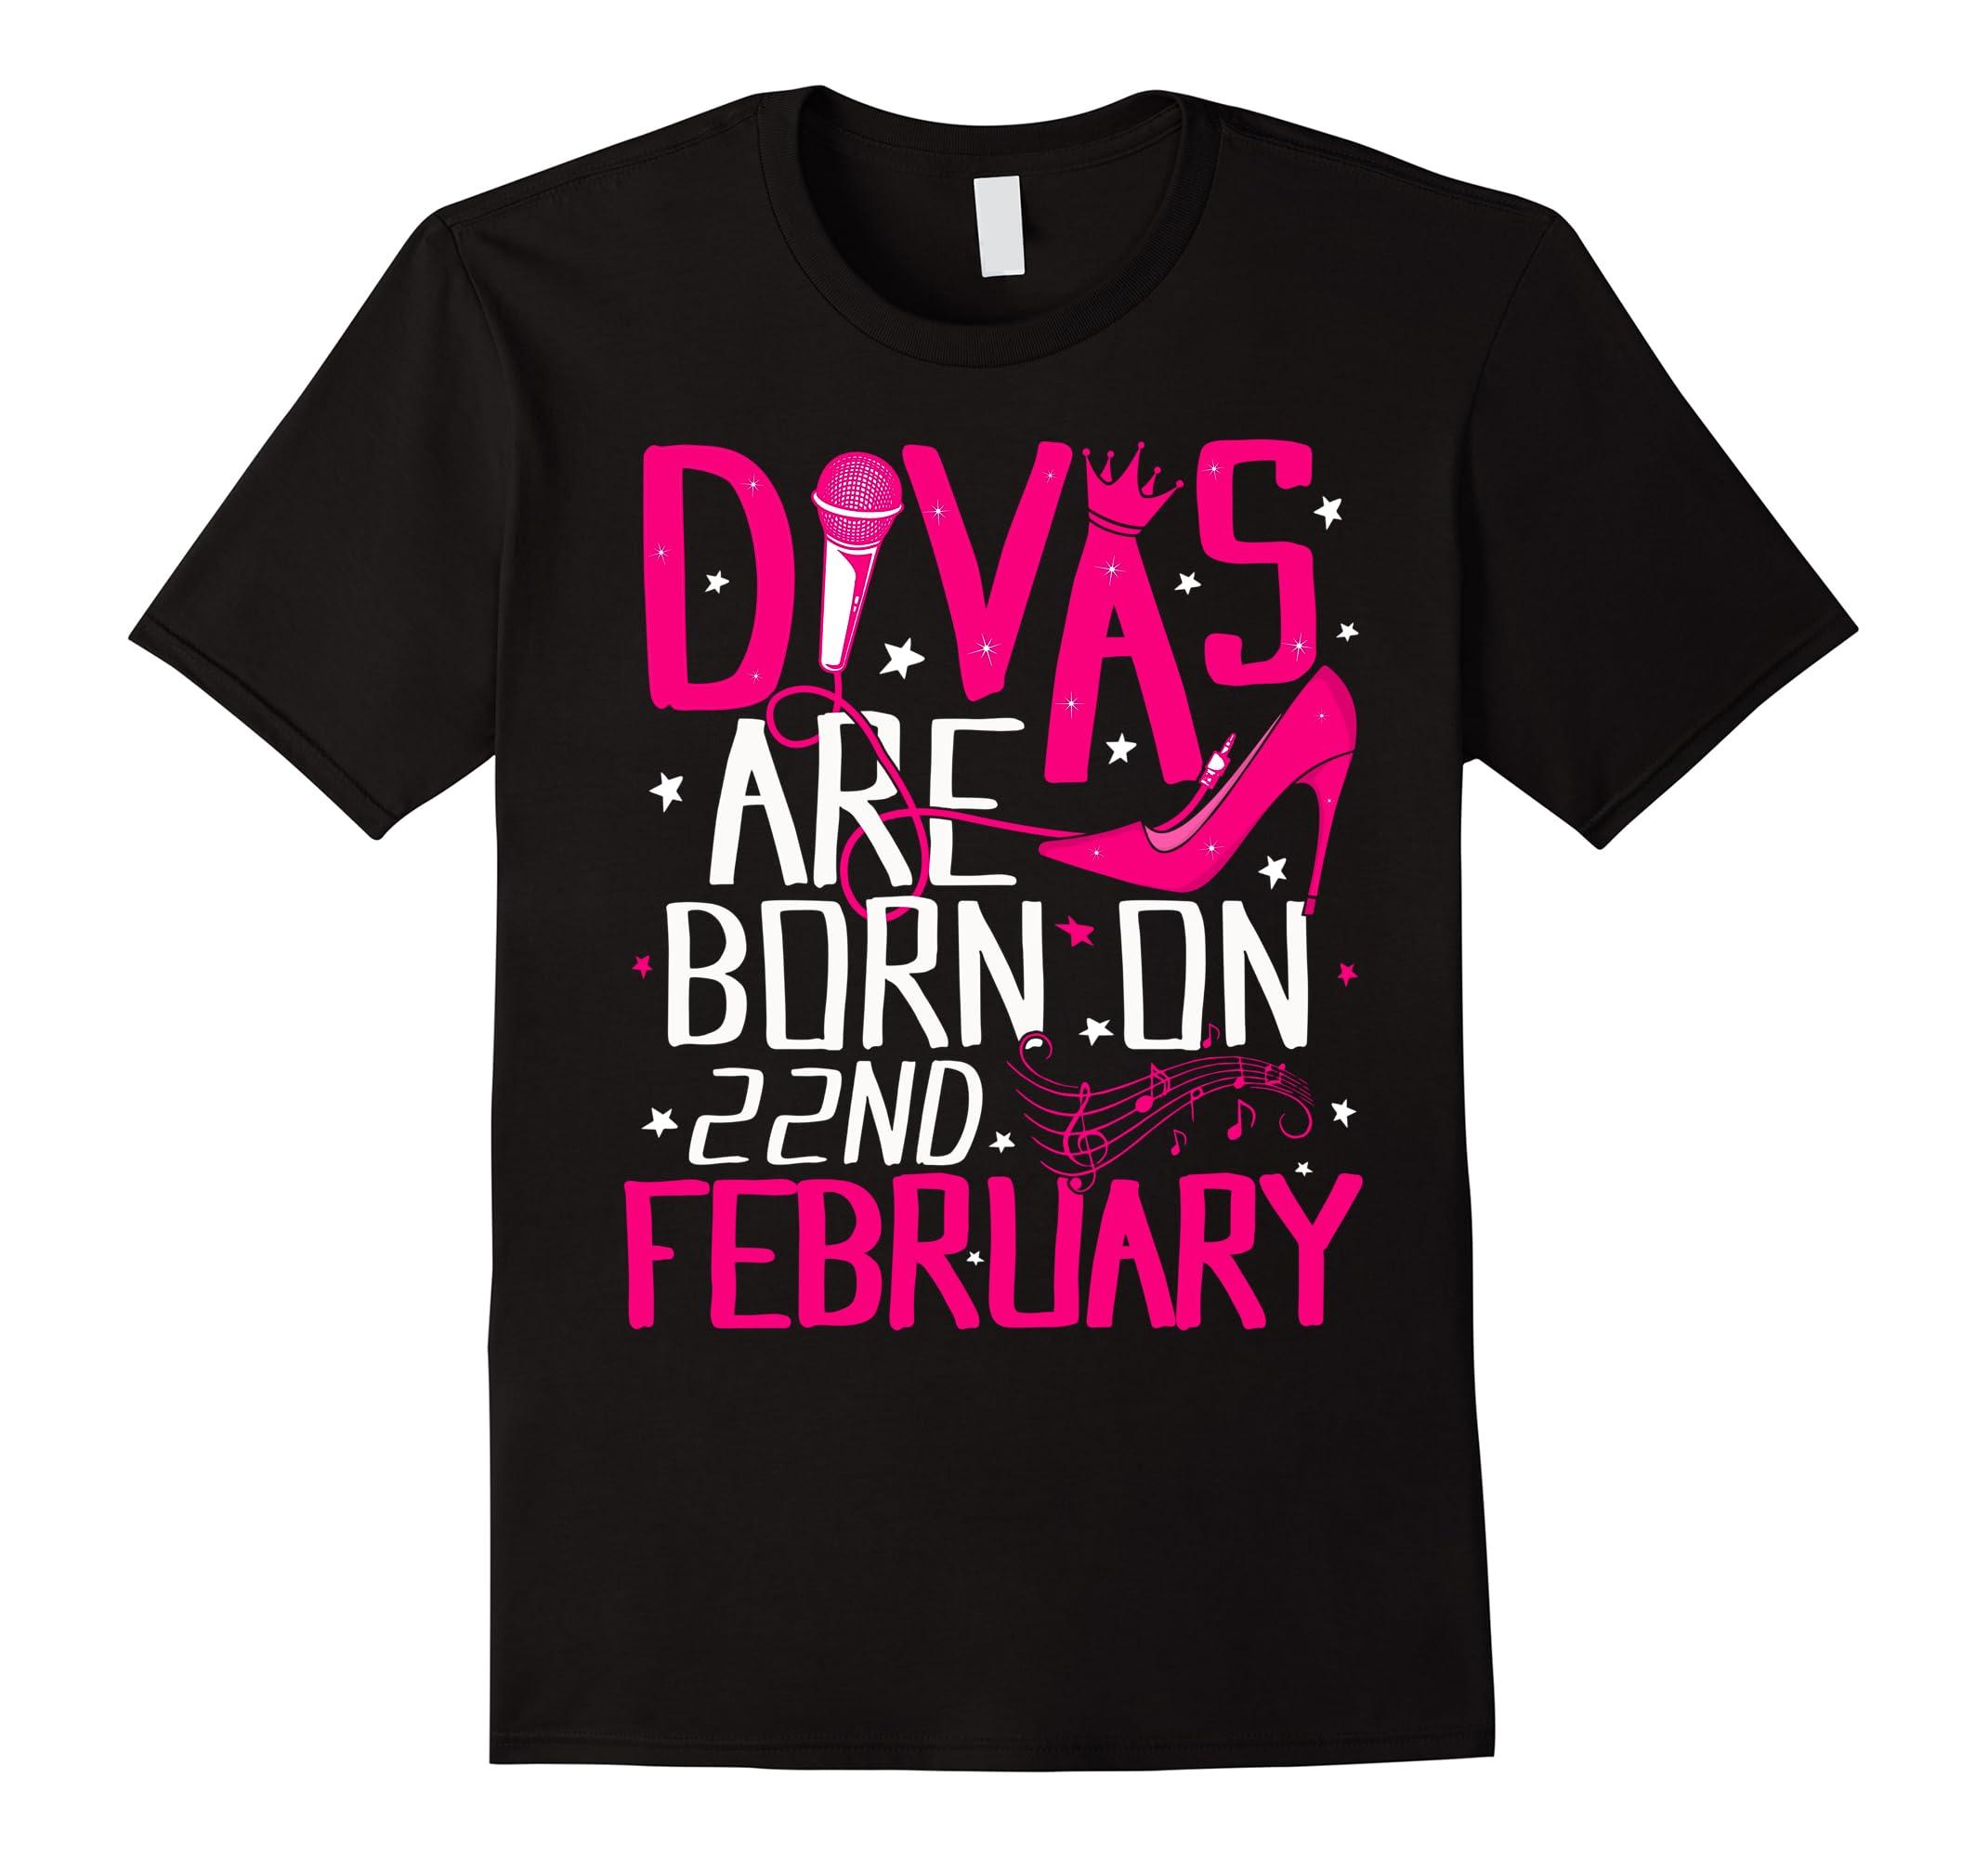 Divas Are Born On February 22nd T-shirt February Birthday-ah my shirt one  gift